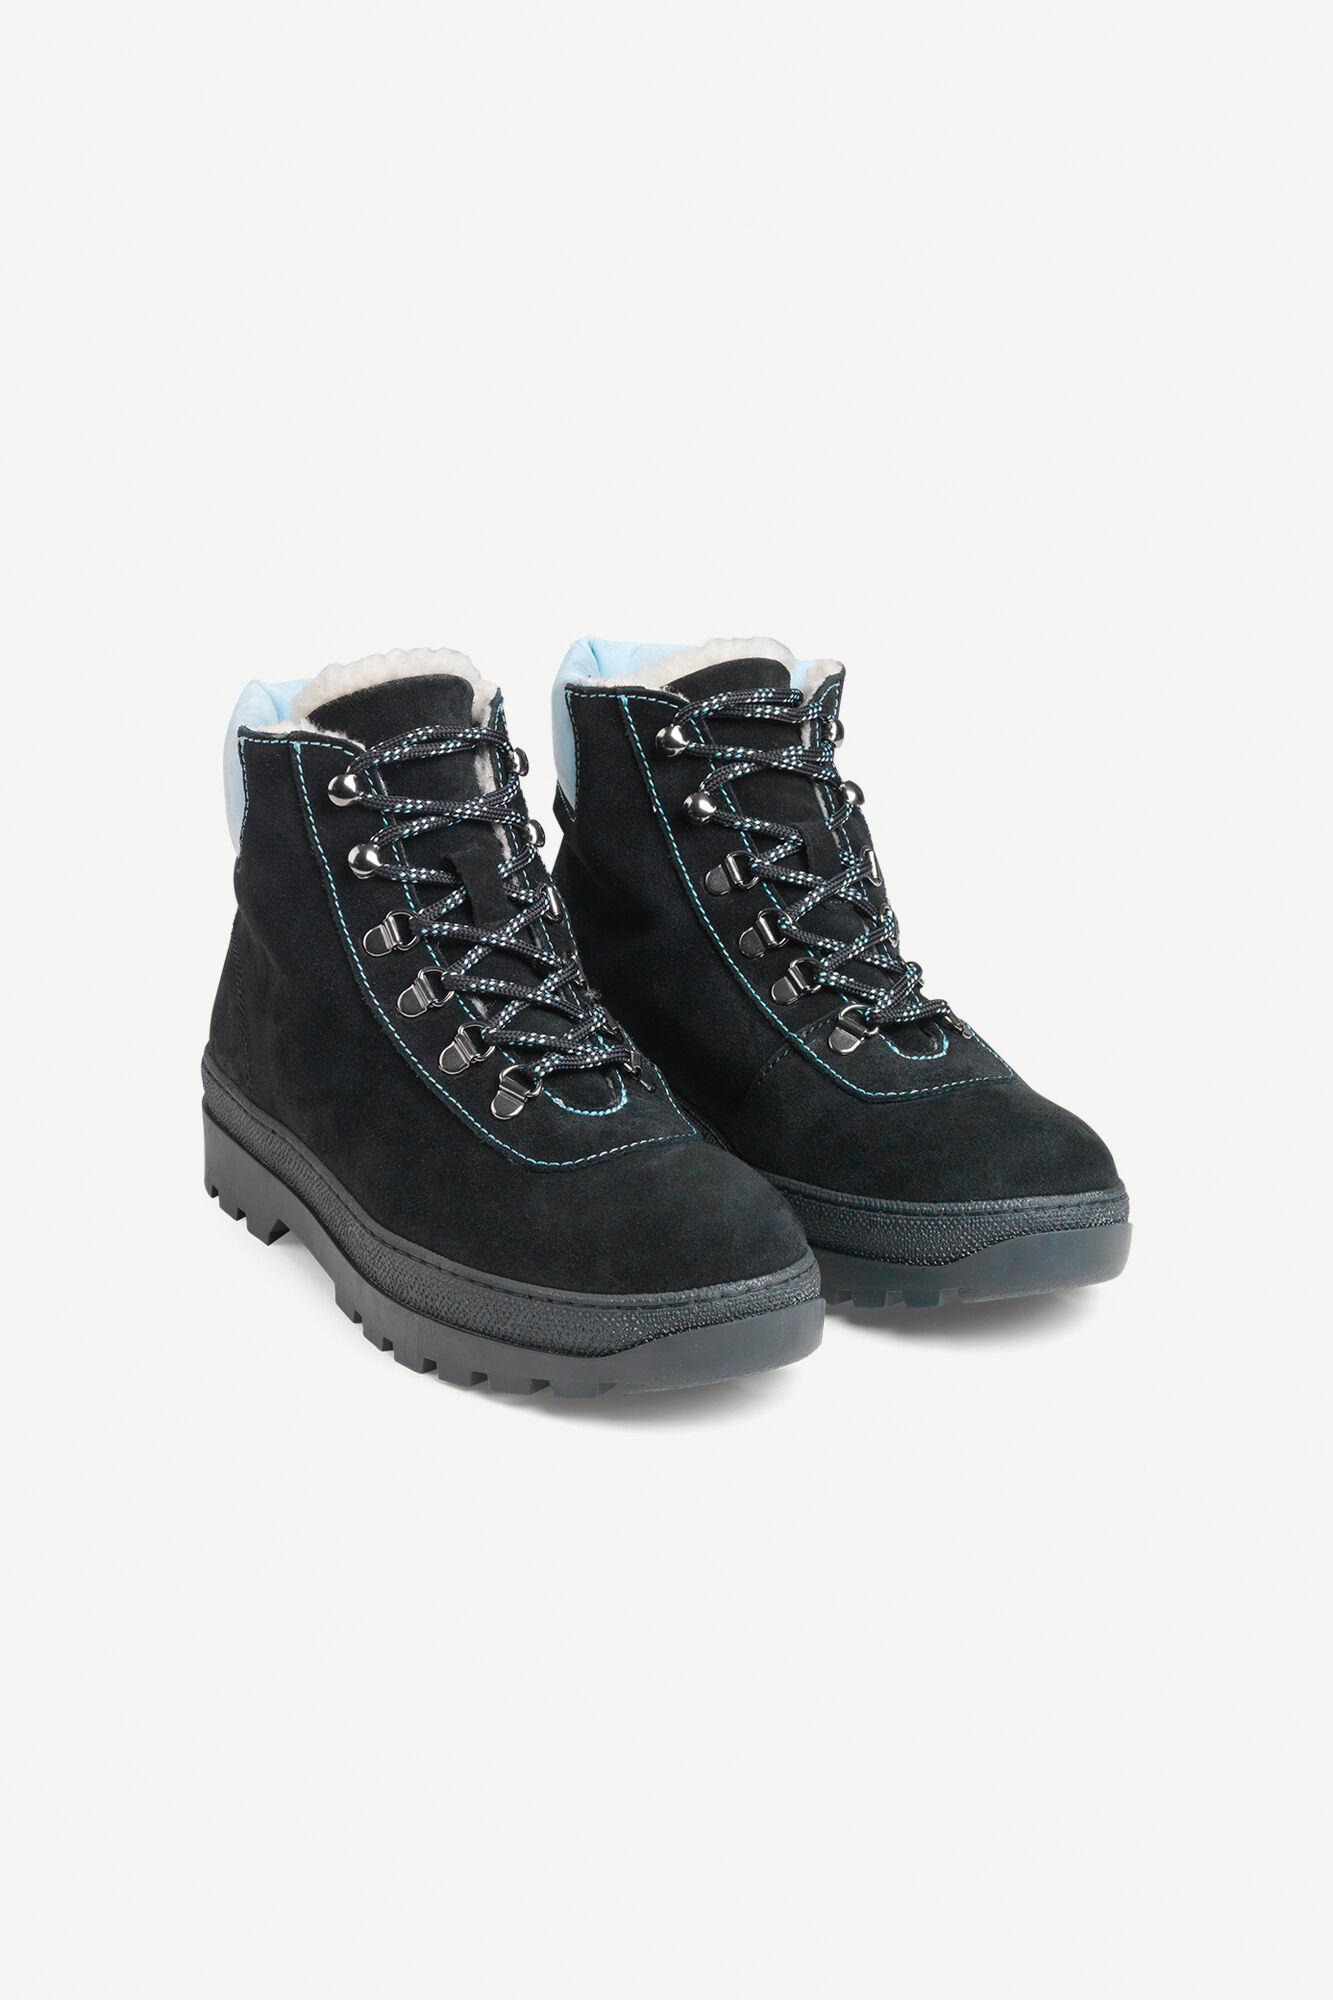 Hiker boot 6724